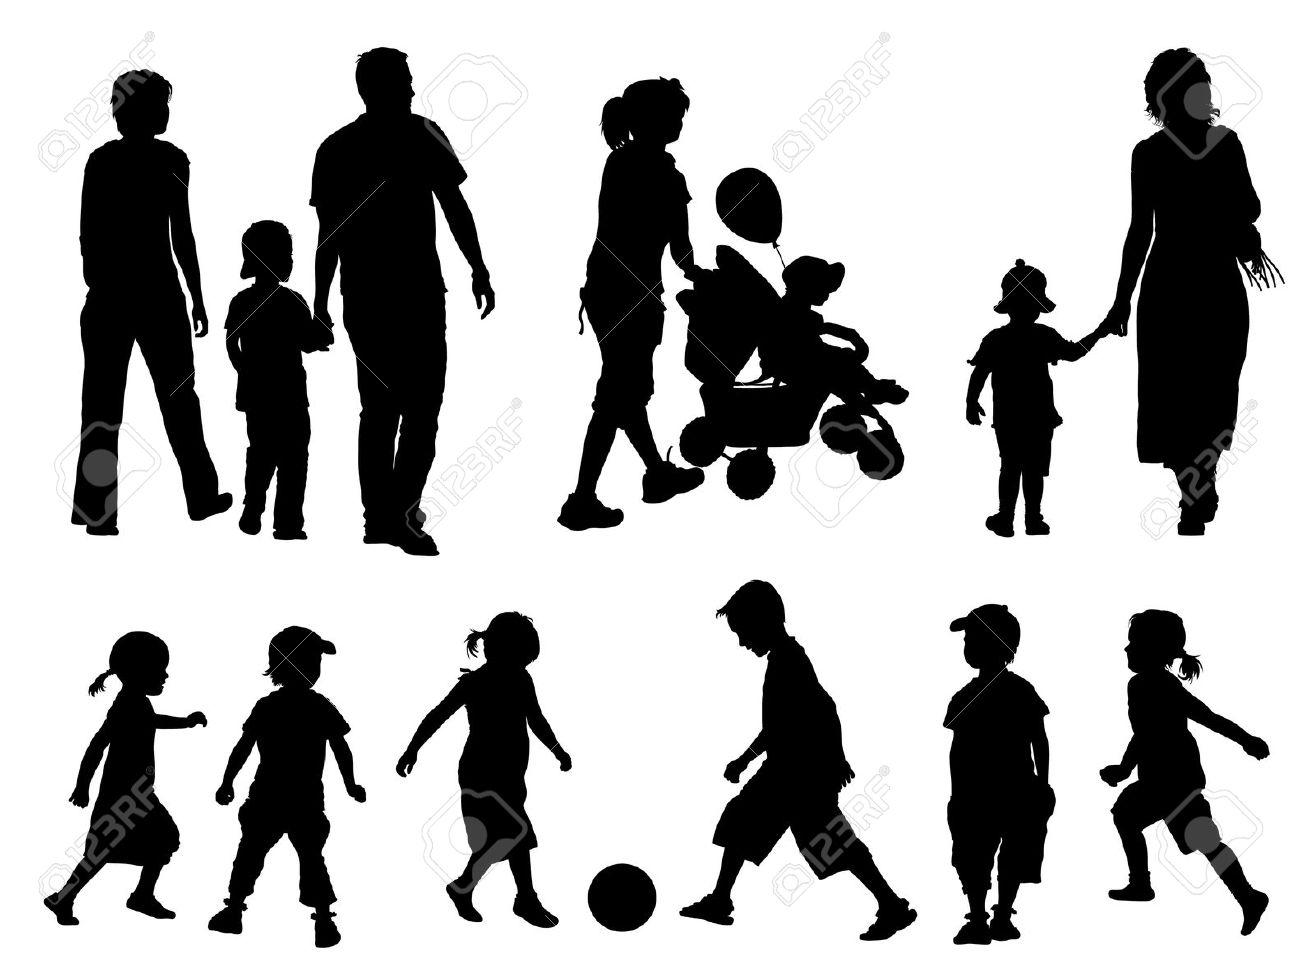 http://previews.123rf.com/images/Kamaga/Kamaga0908/Kamaga090800010/5330223-A-set-of-parents-and-children-silhouettes-Vector-illustration--Stock-Vector.jpg